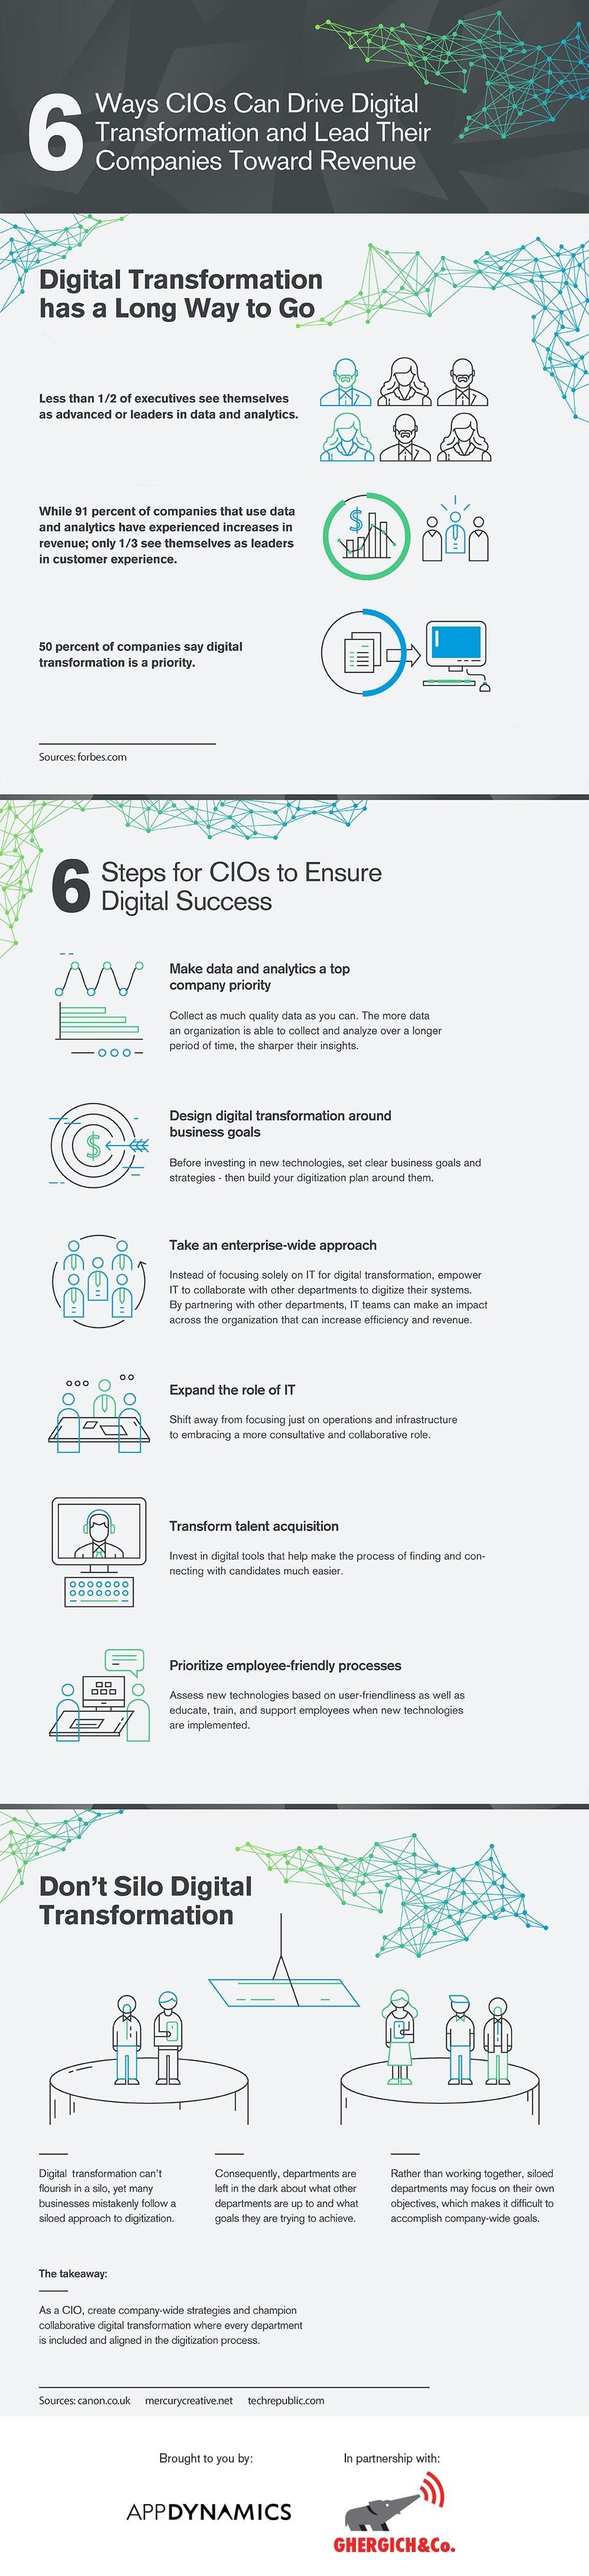 6 Ways CIOs Can Drive Digital Transformation and Lead Their Companies Toward Revenue